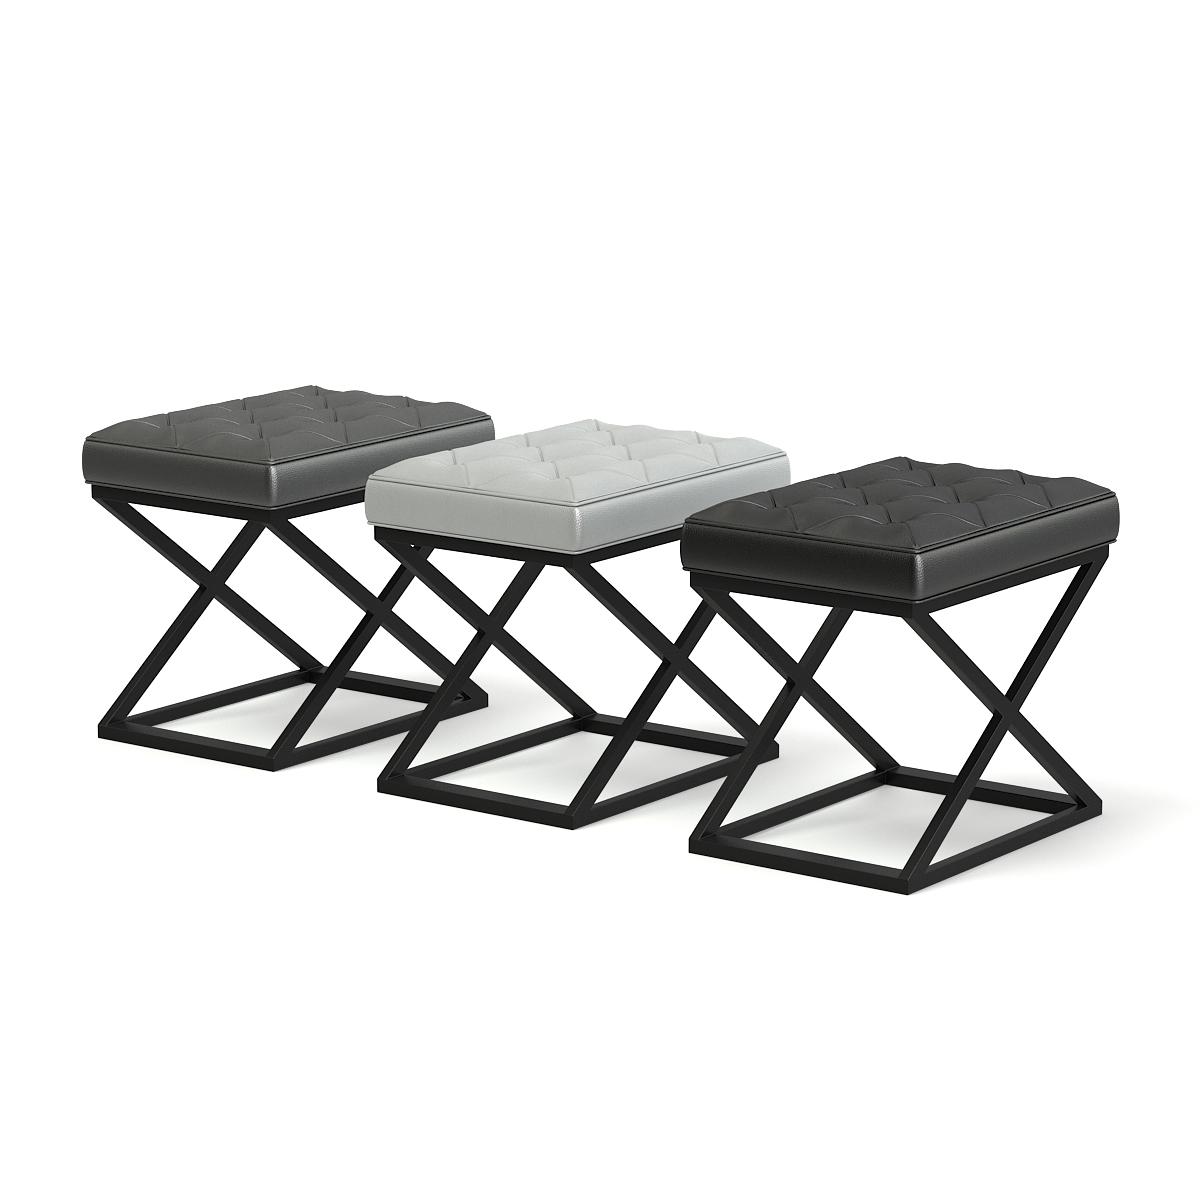 1200x1200 Furniture 3d Models Volume 97 Cgaxis 3d Models Store